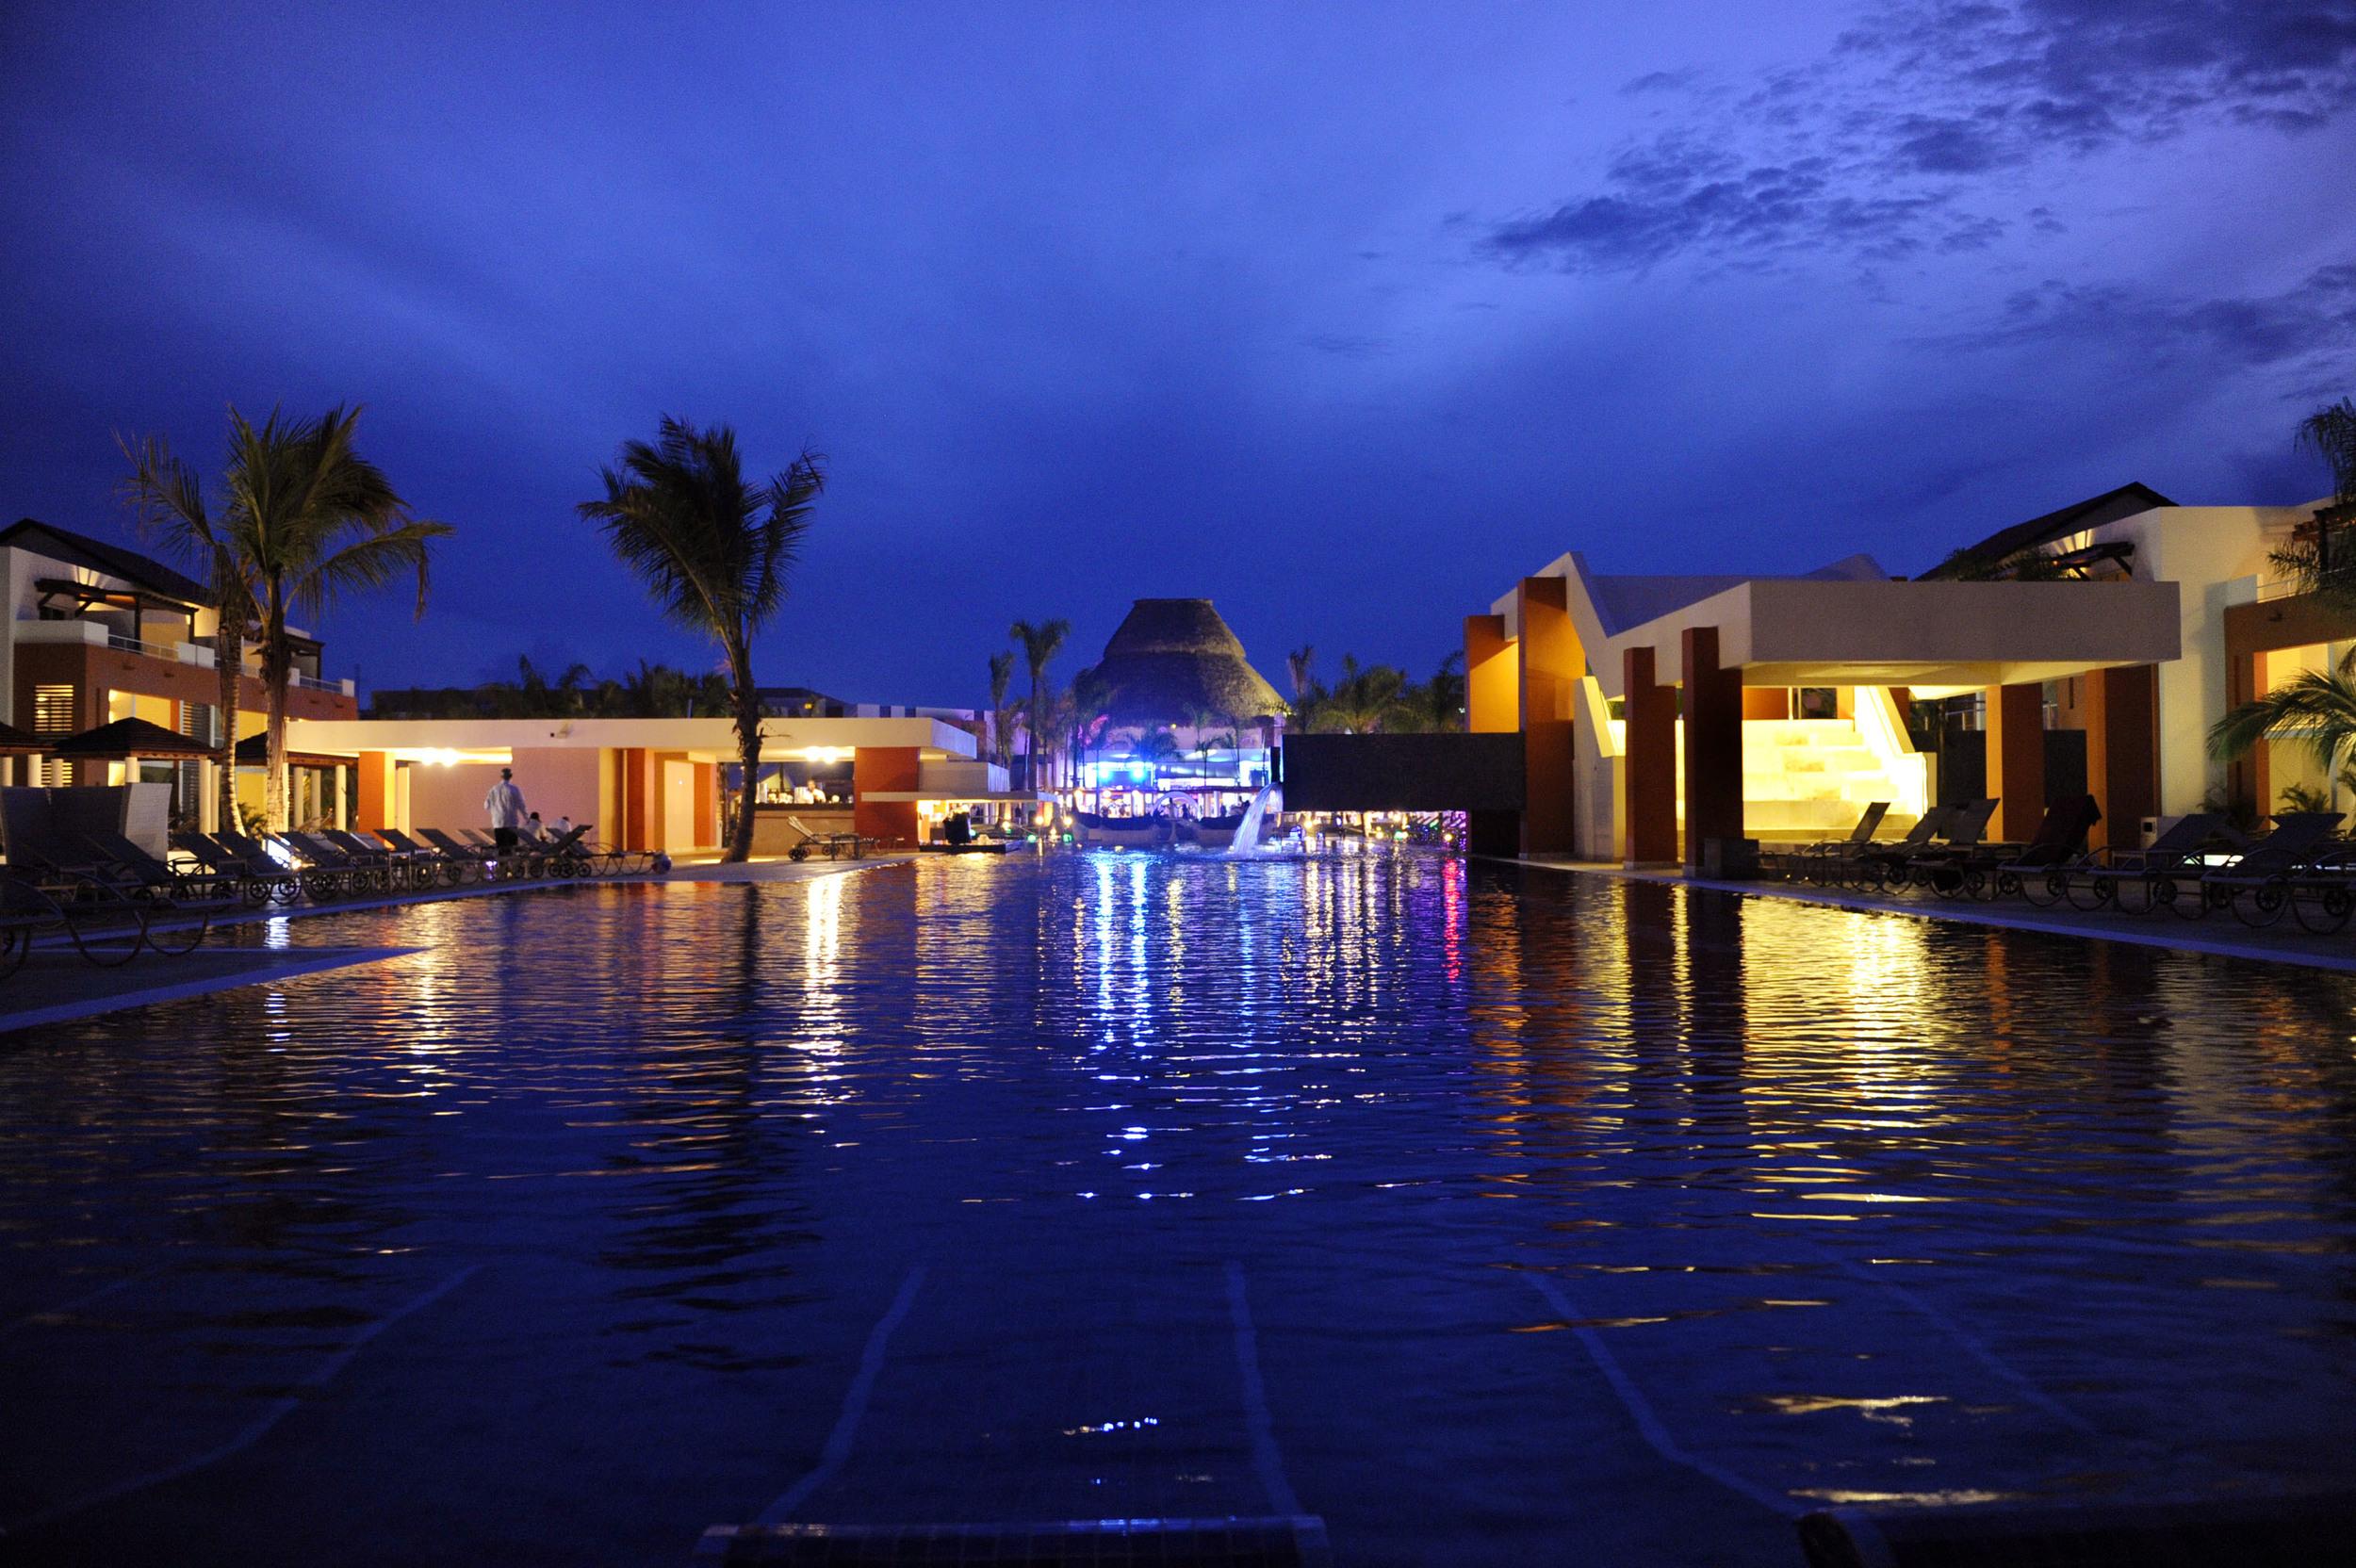 Image via: Breathless Punta Cana Resort and Spa